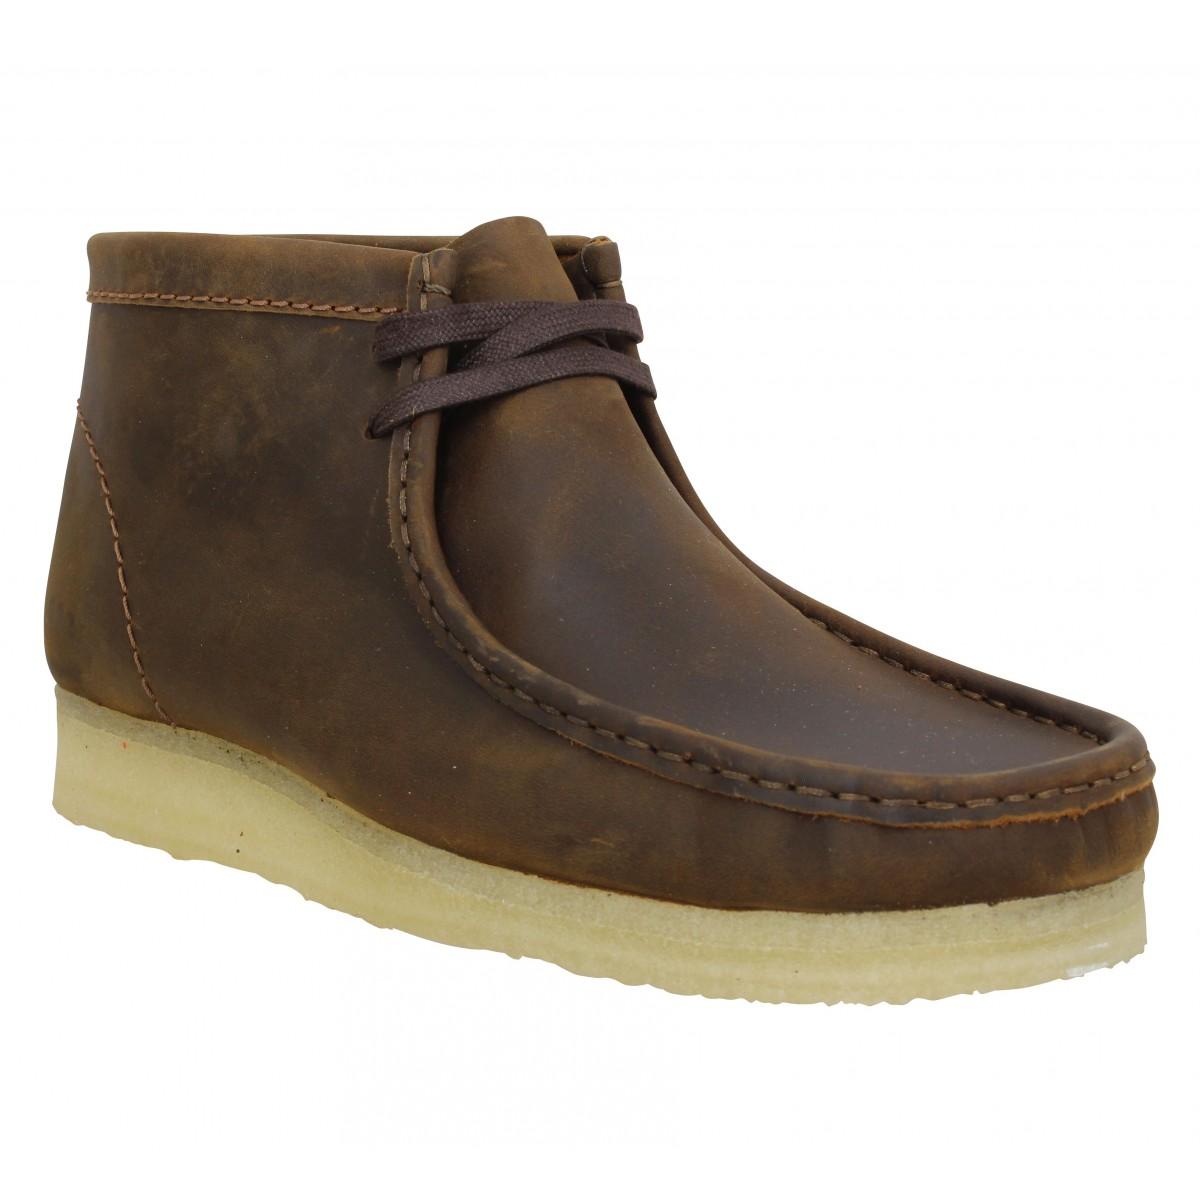 Bottines CLARKS ORIGINALS Wallabee Boot cuir Homme Beeswax